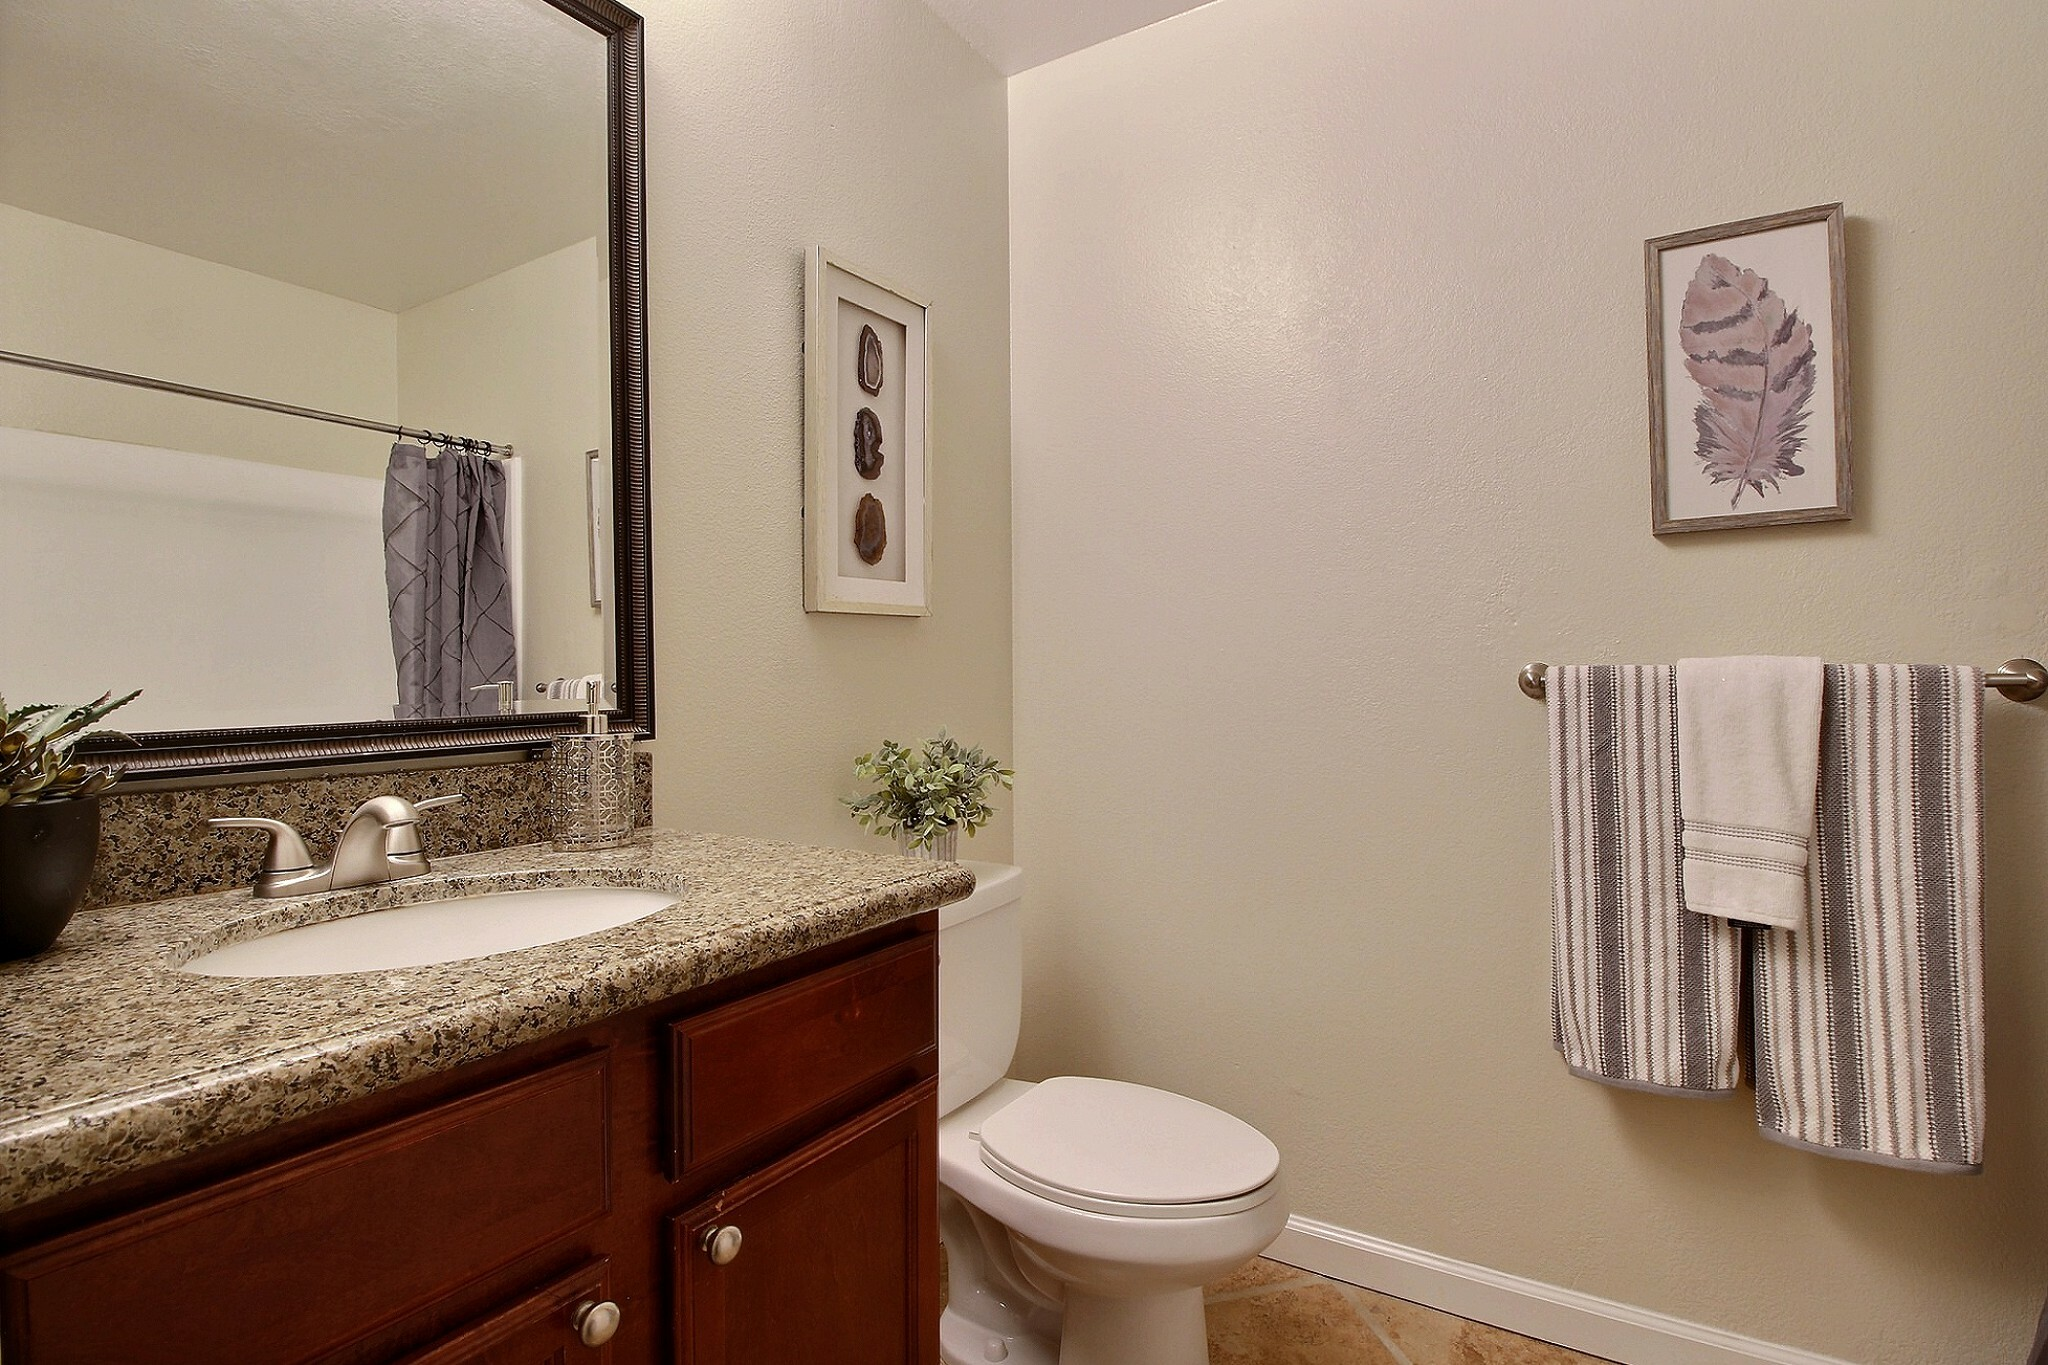 exposio_09_bathroom_1_01_973_catkin_ct_s